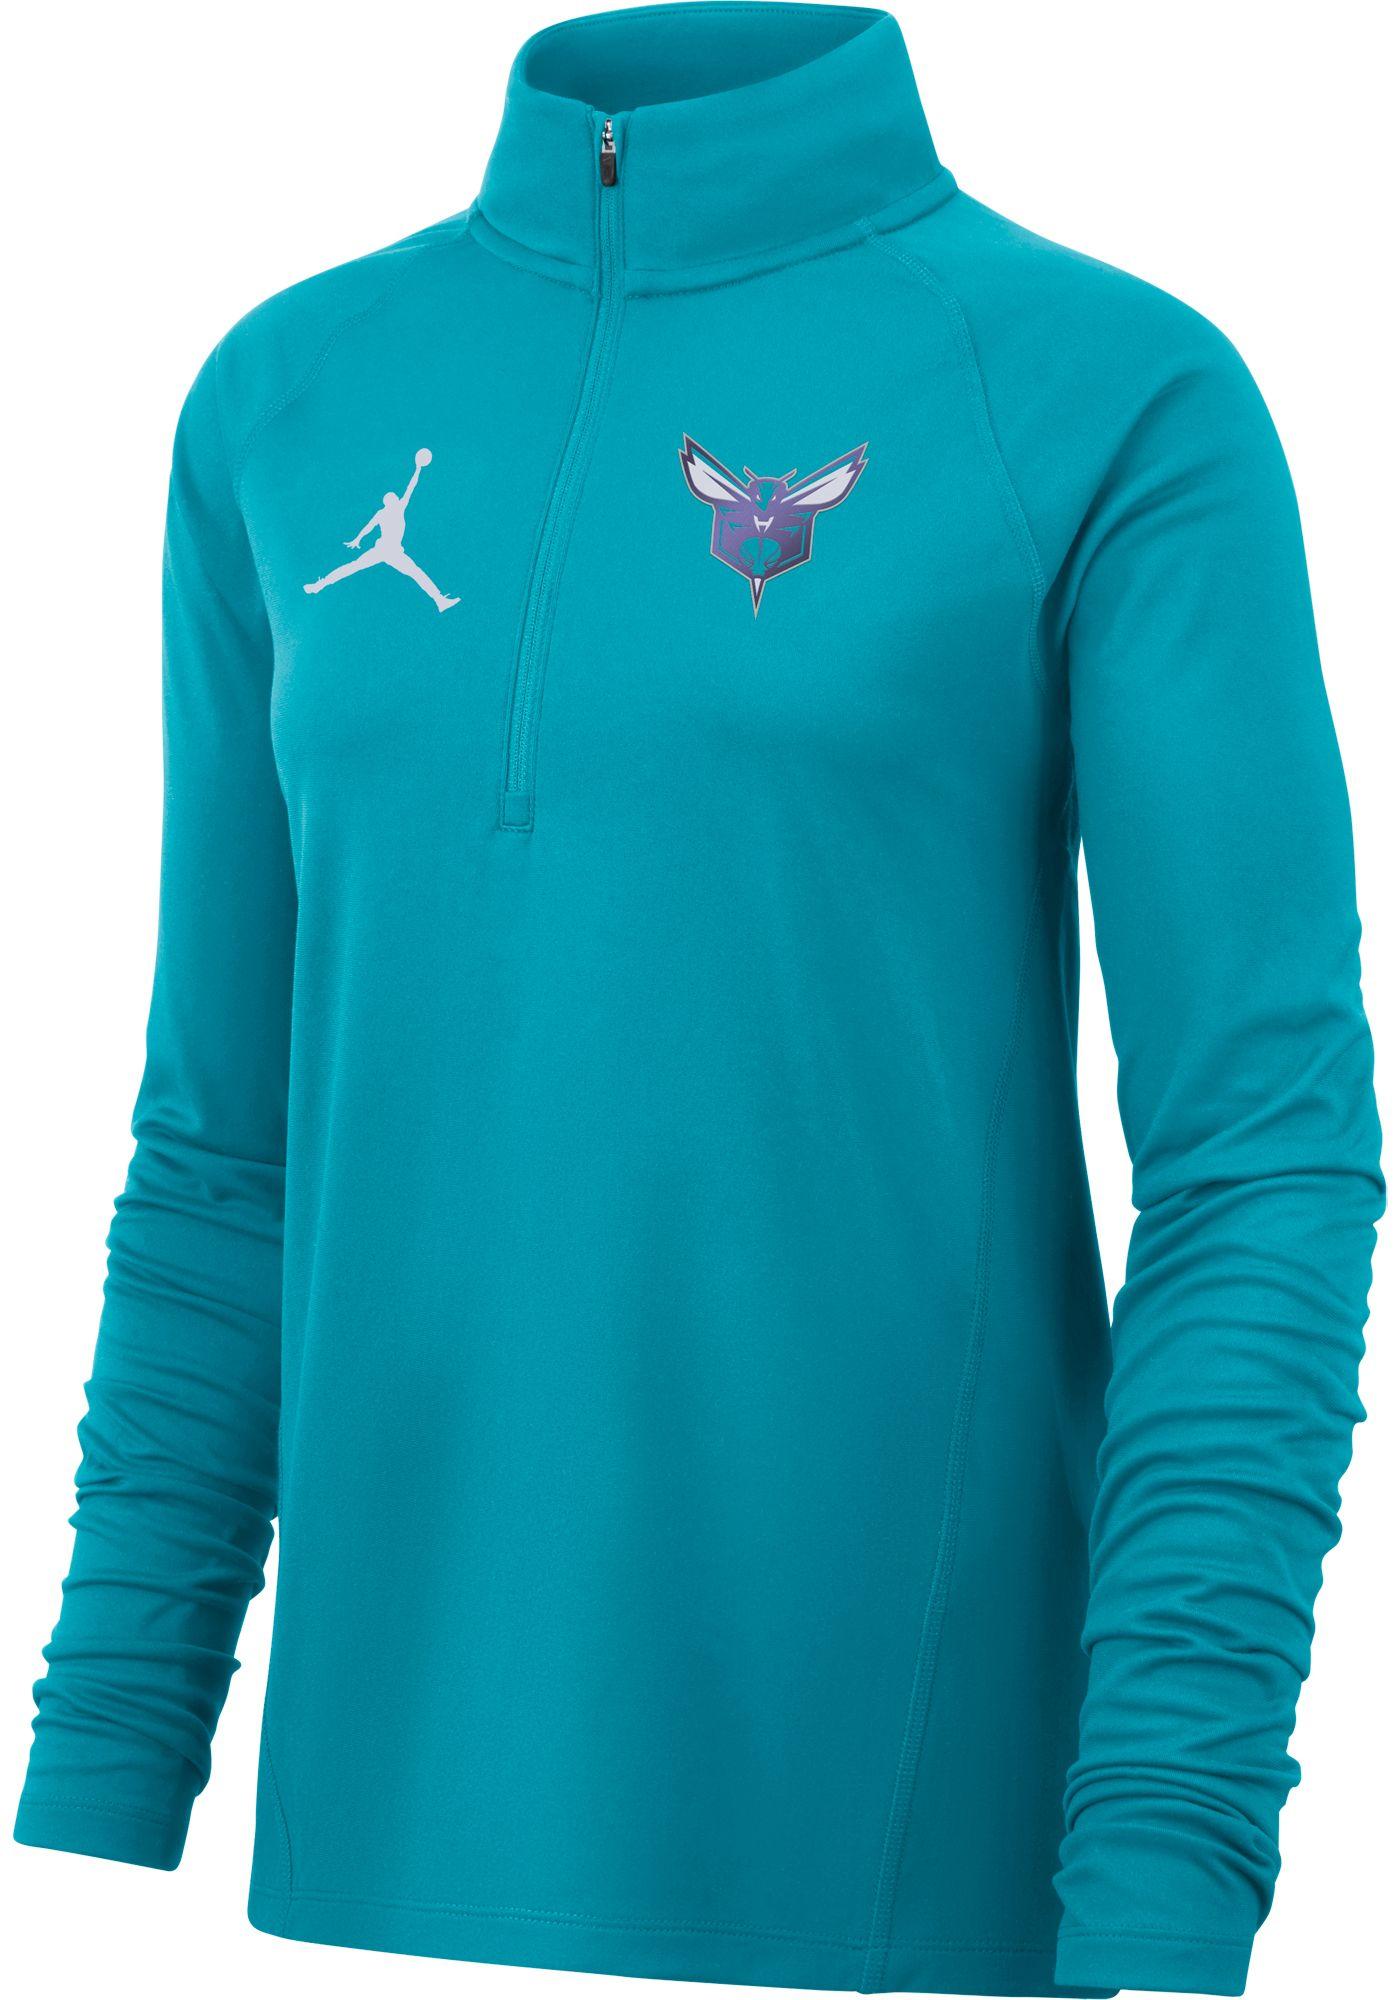 Jordan Women's Charlotte Hornets Dri-FIT Element Half-Zip Pullover